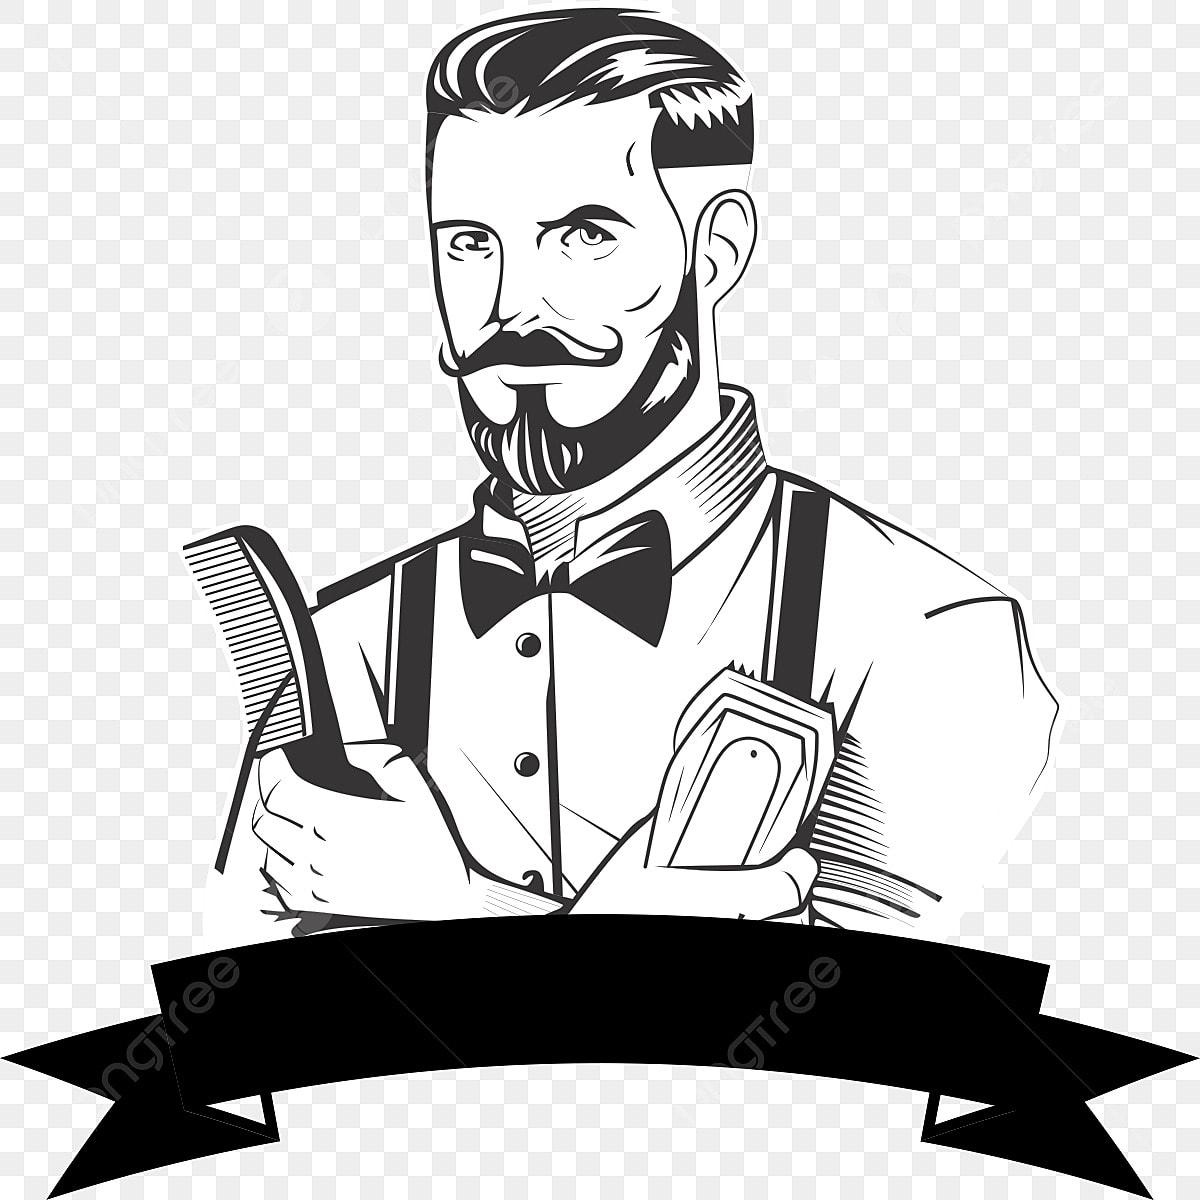 Caricaturas De Barber Barber Cartoon Barber Division De Dibujos